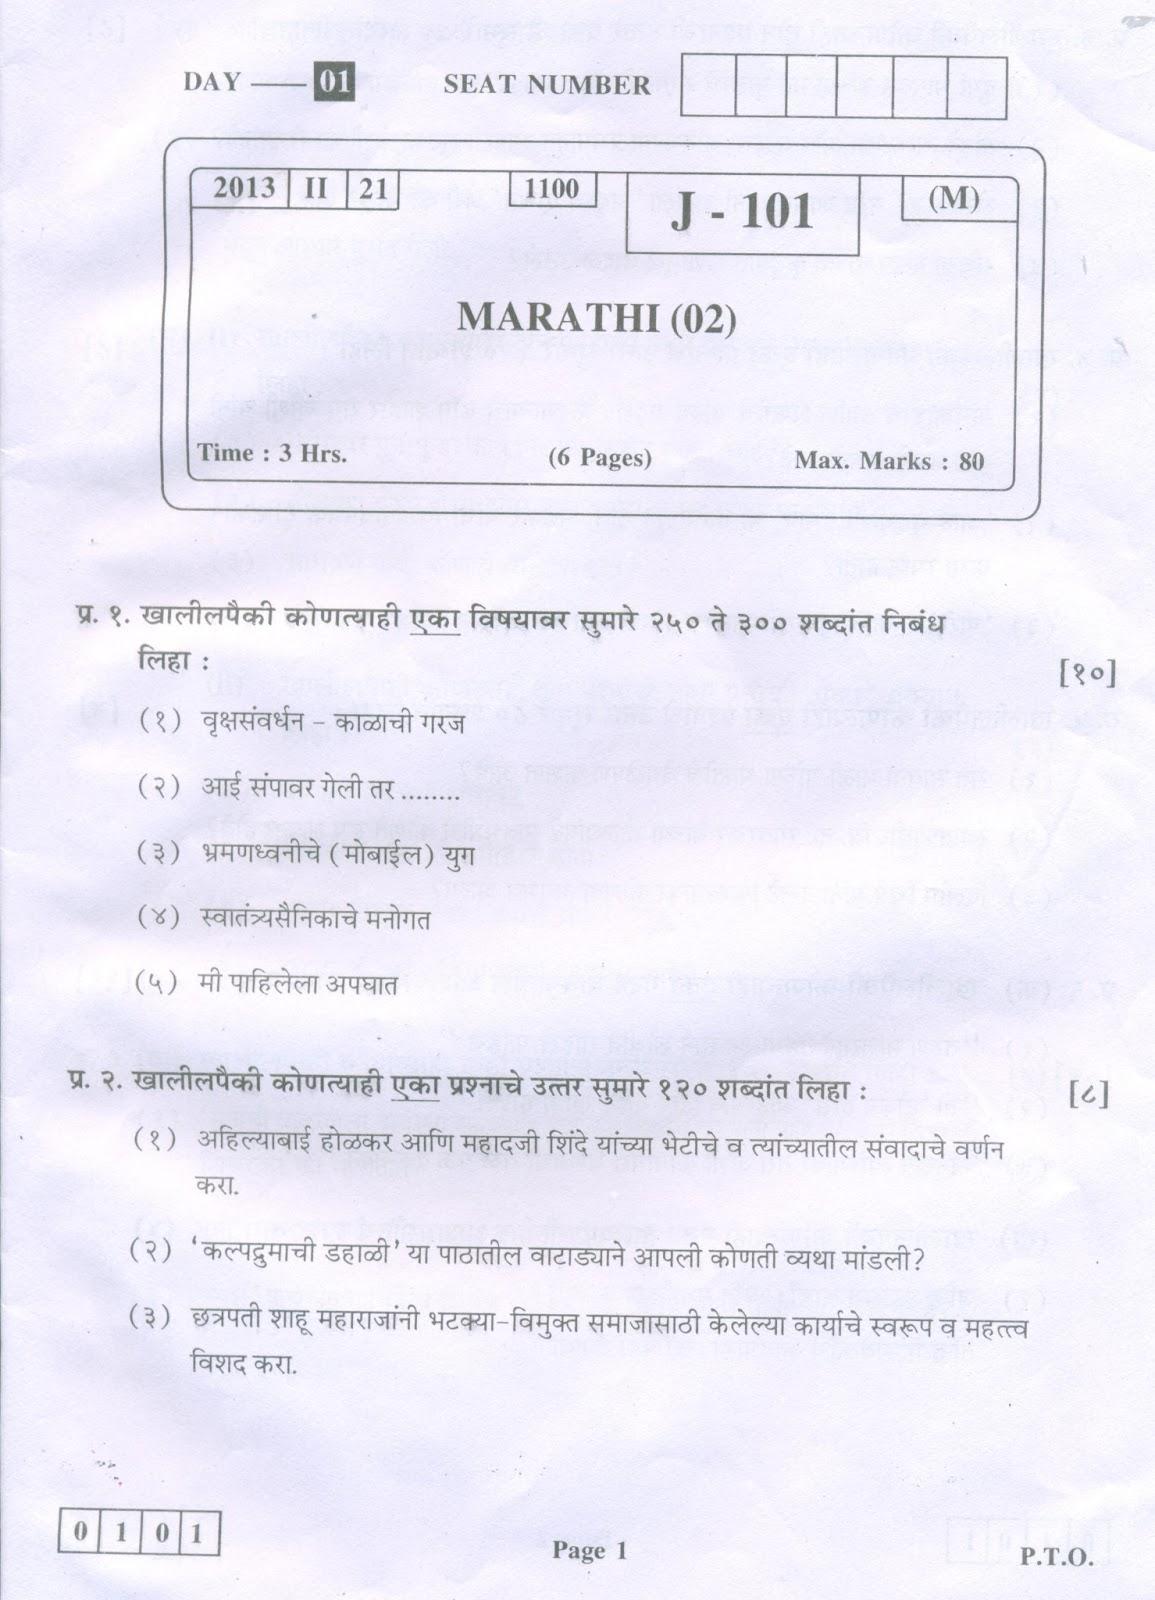 Witness essay 2012 hsc